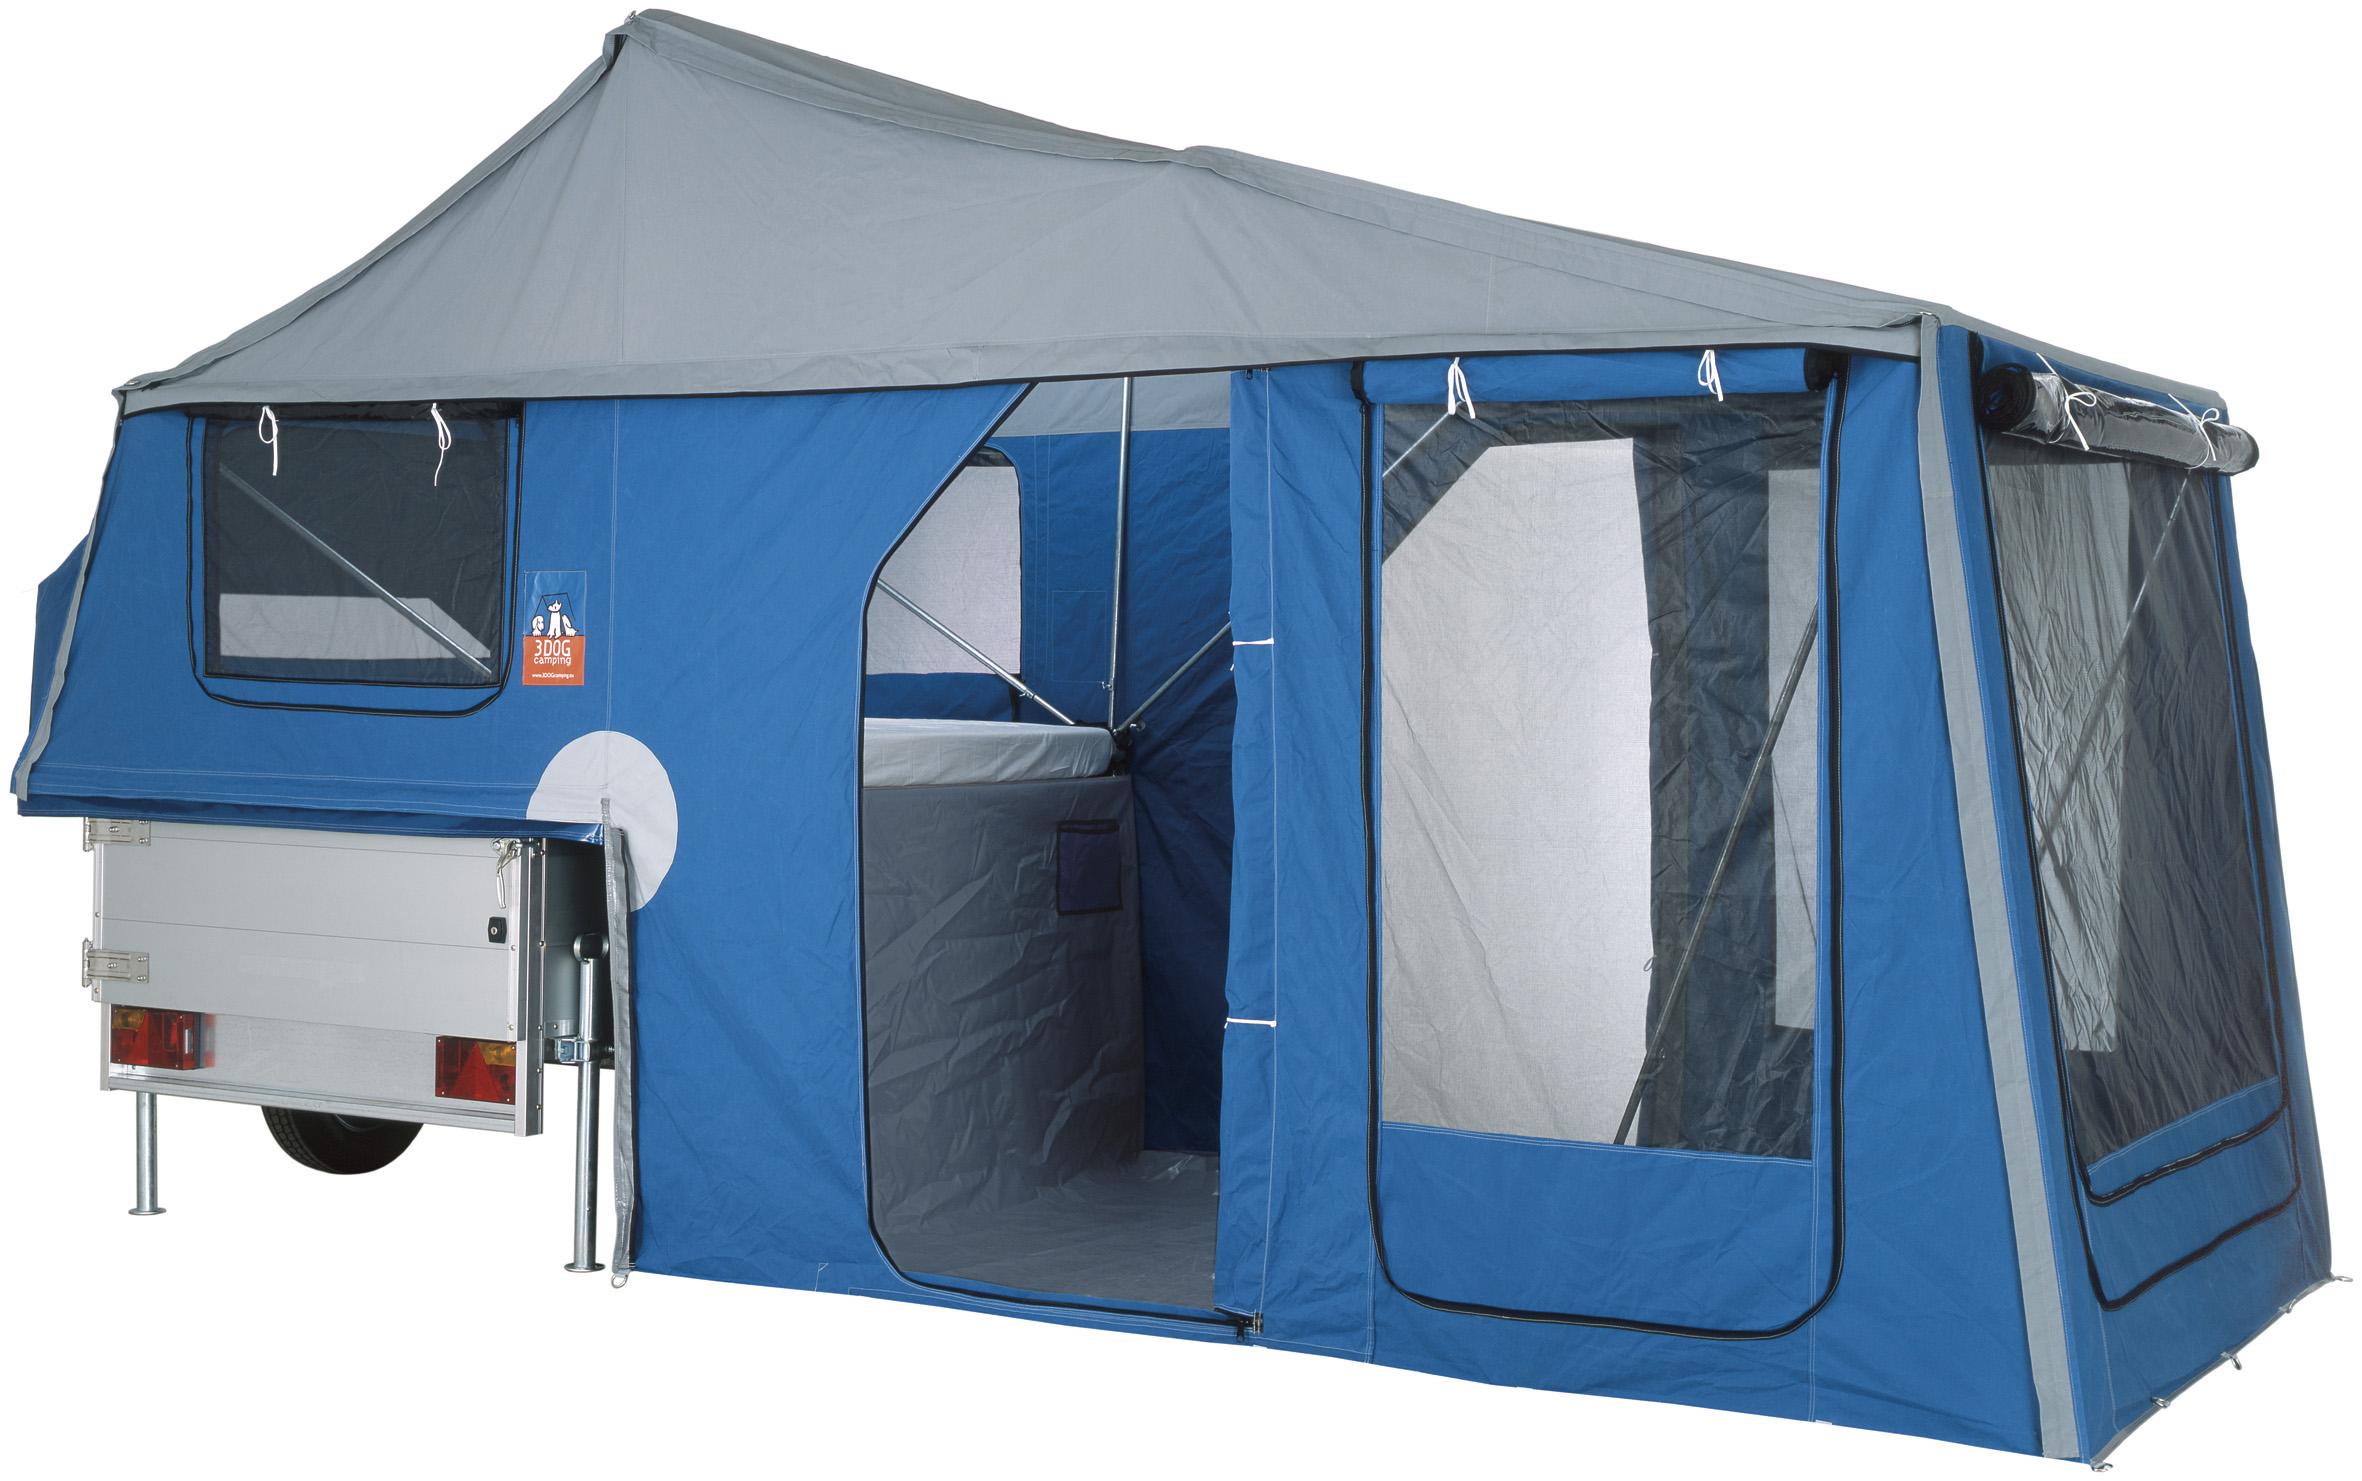 kurzvorstellung 3dog camping faltcaravans aus hamburg. Black Bedroom Furniture Sets. Home Design Ideas